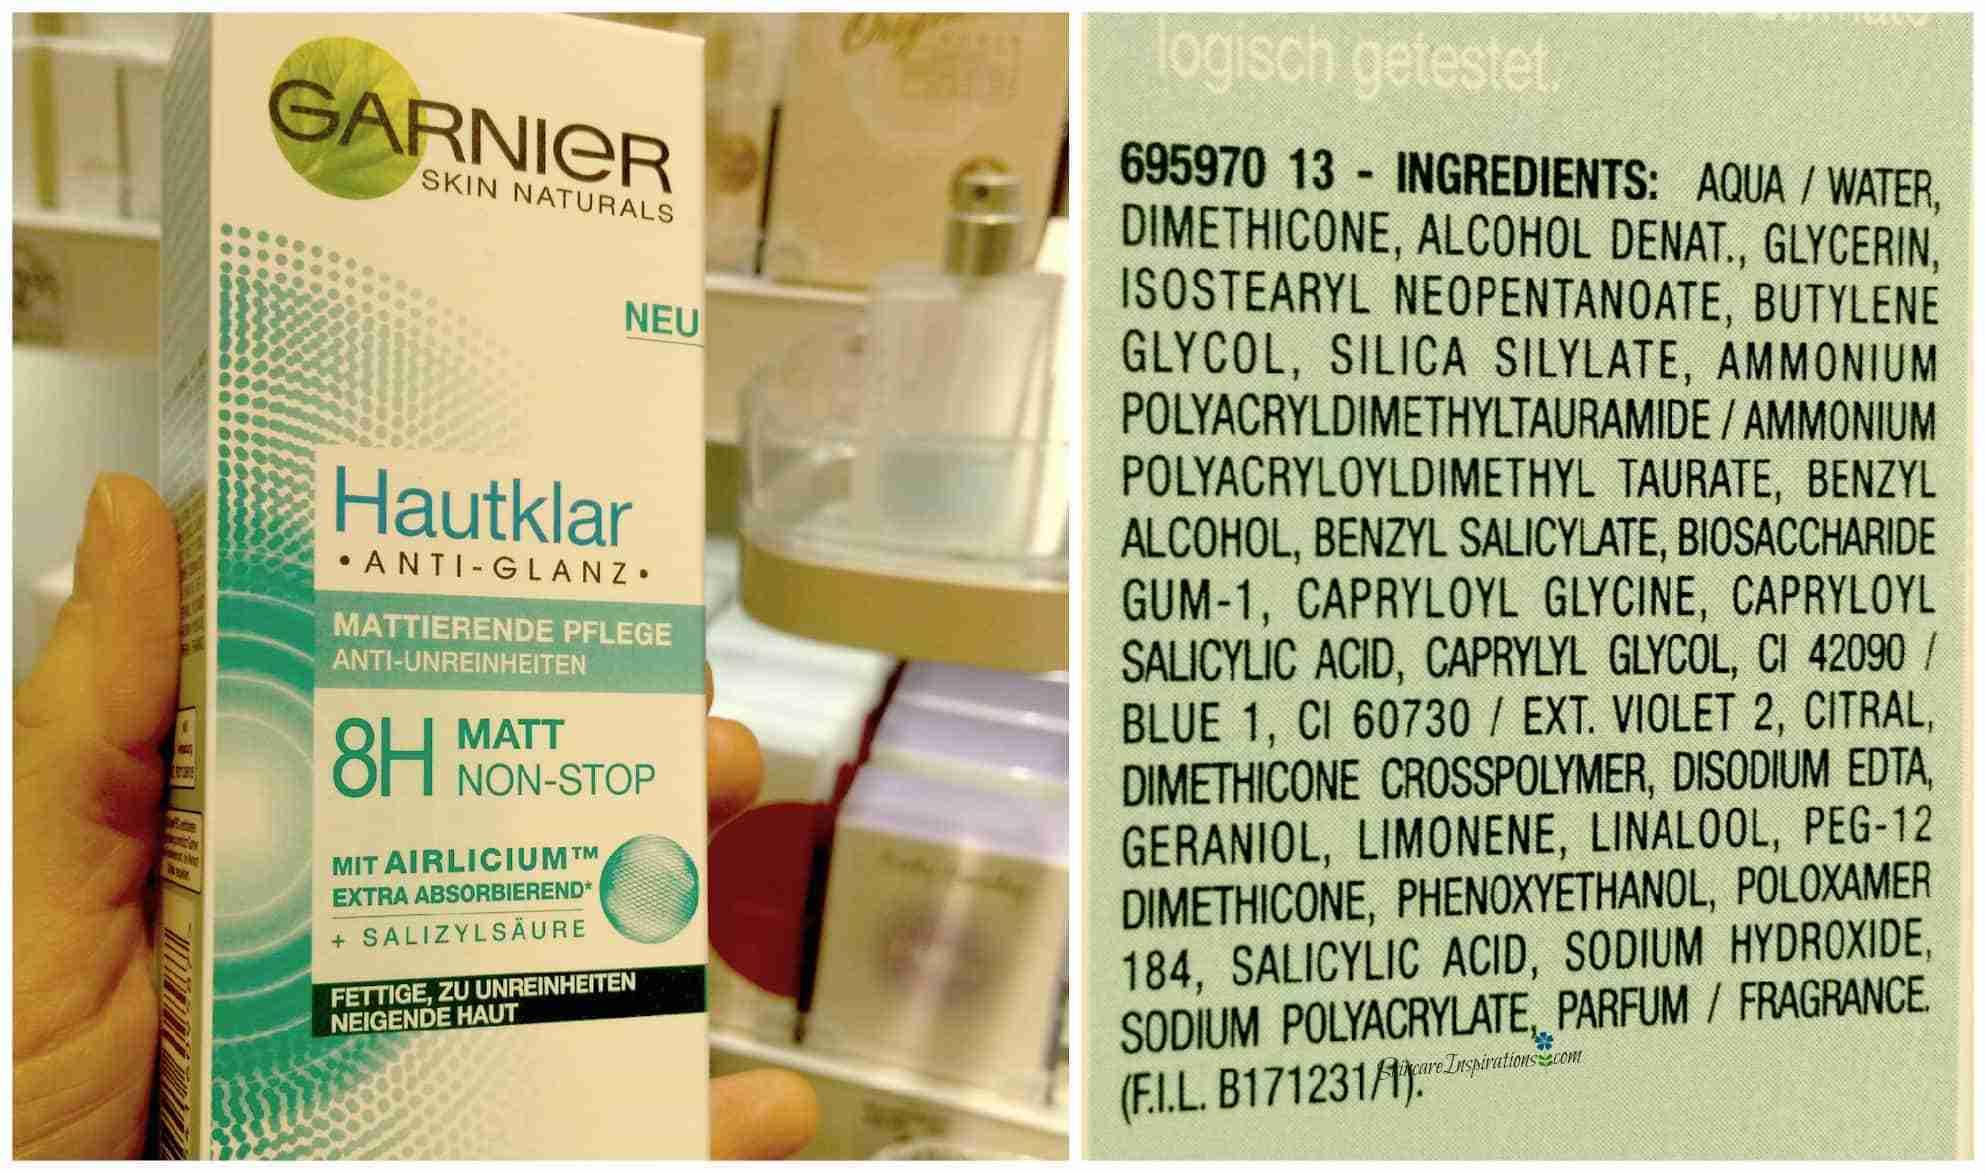 Garnier Hautklar Matt Non Stop Drogeriepflegeprodukte